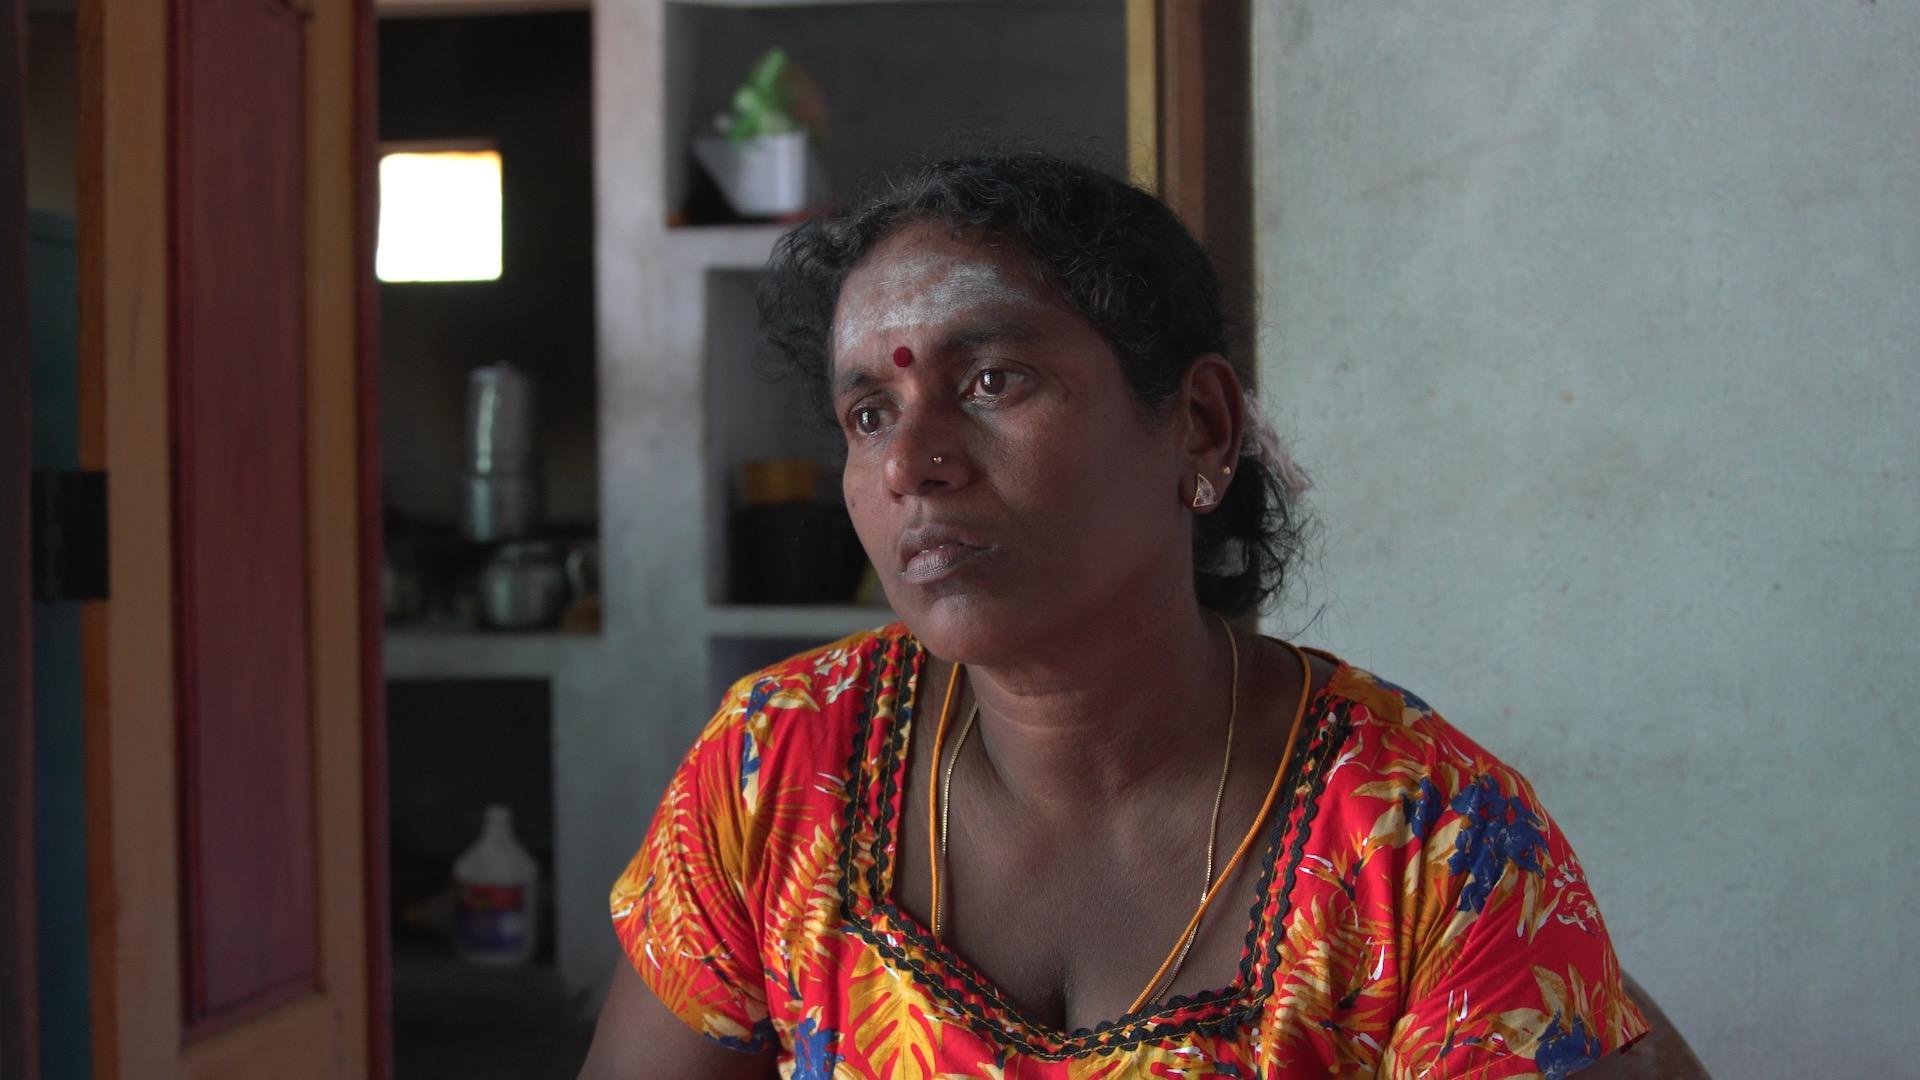 Vasuki at home in Point Pedro, Jaffna district